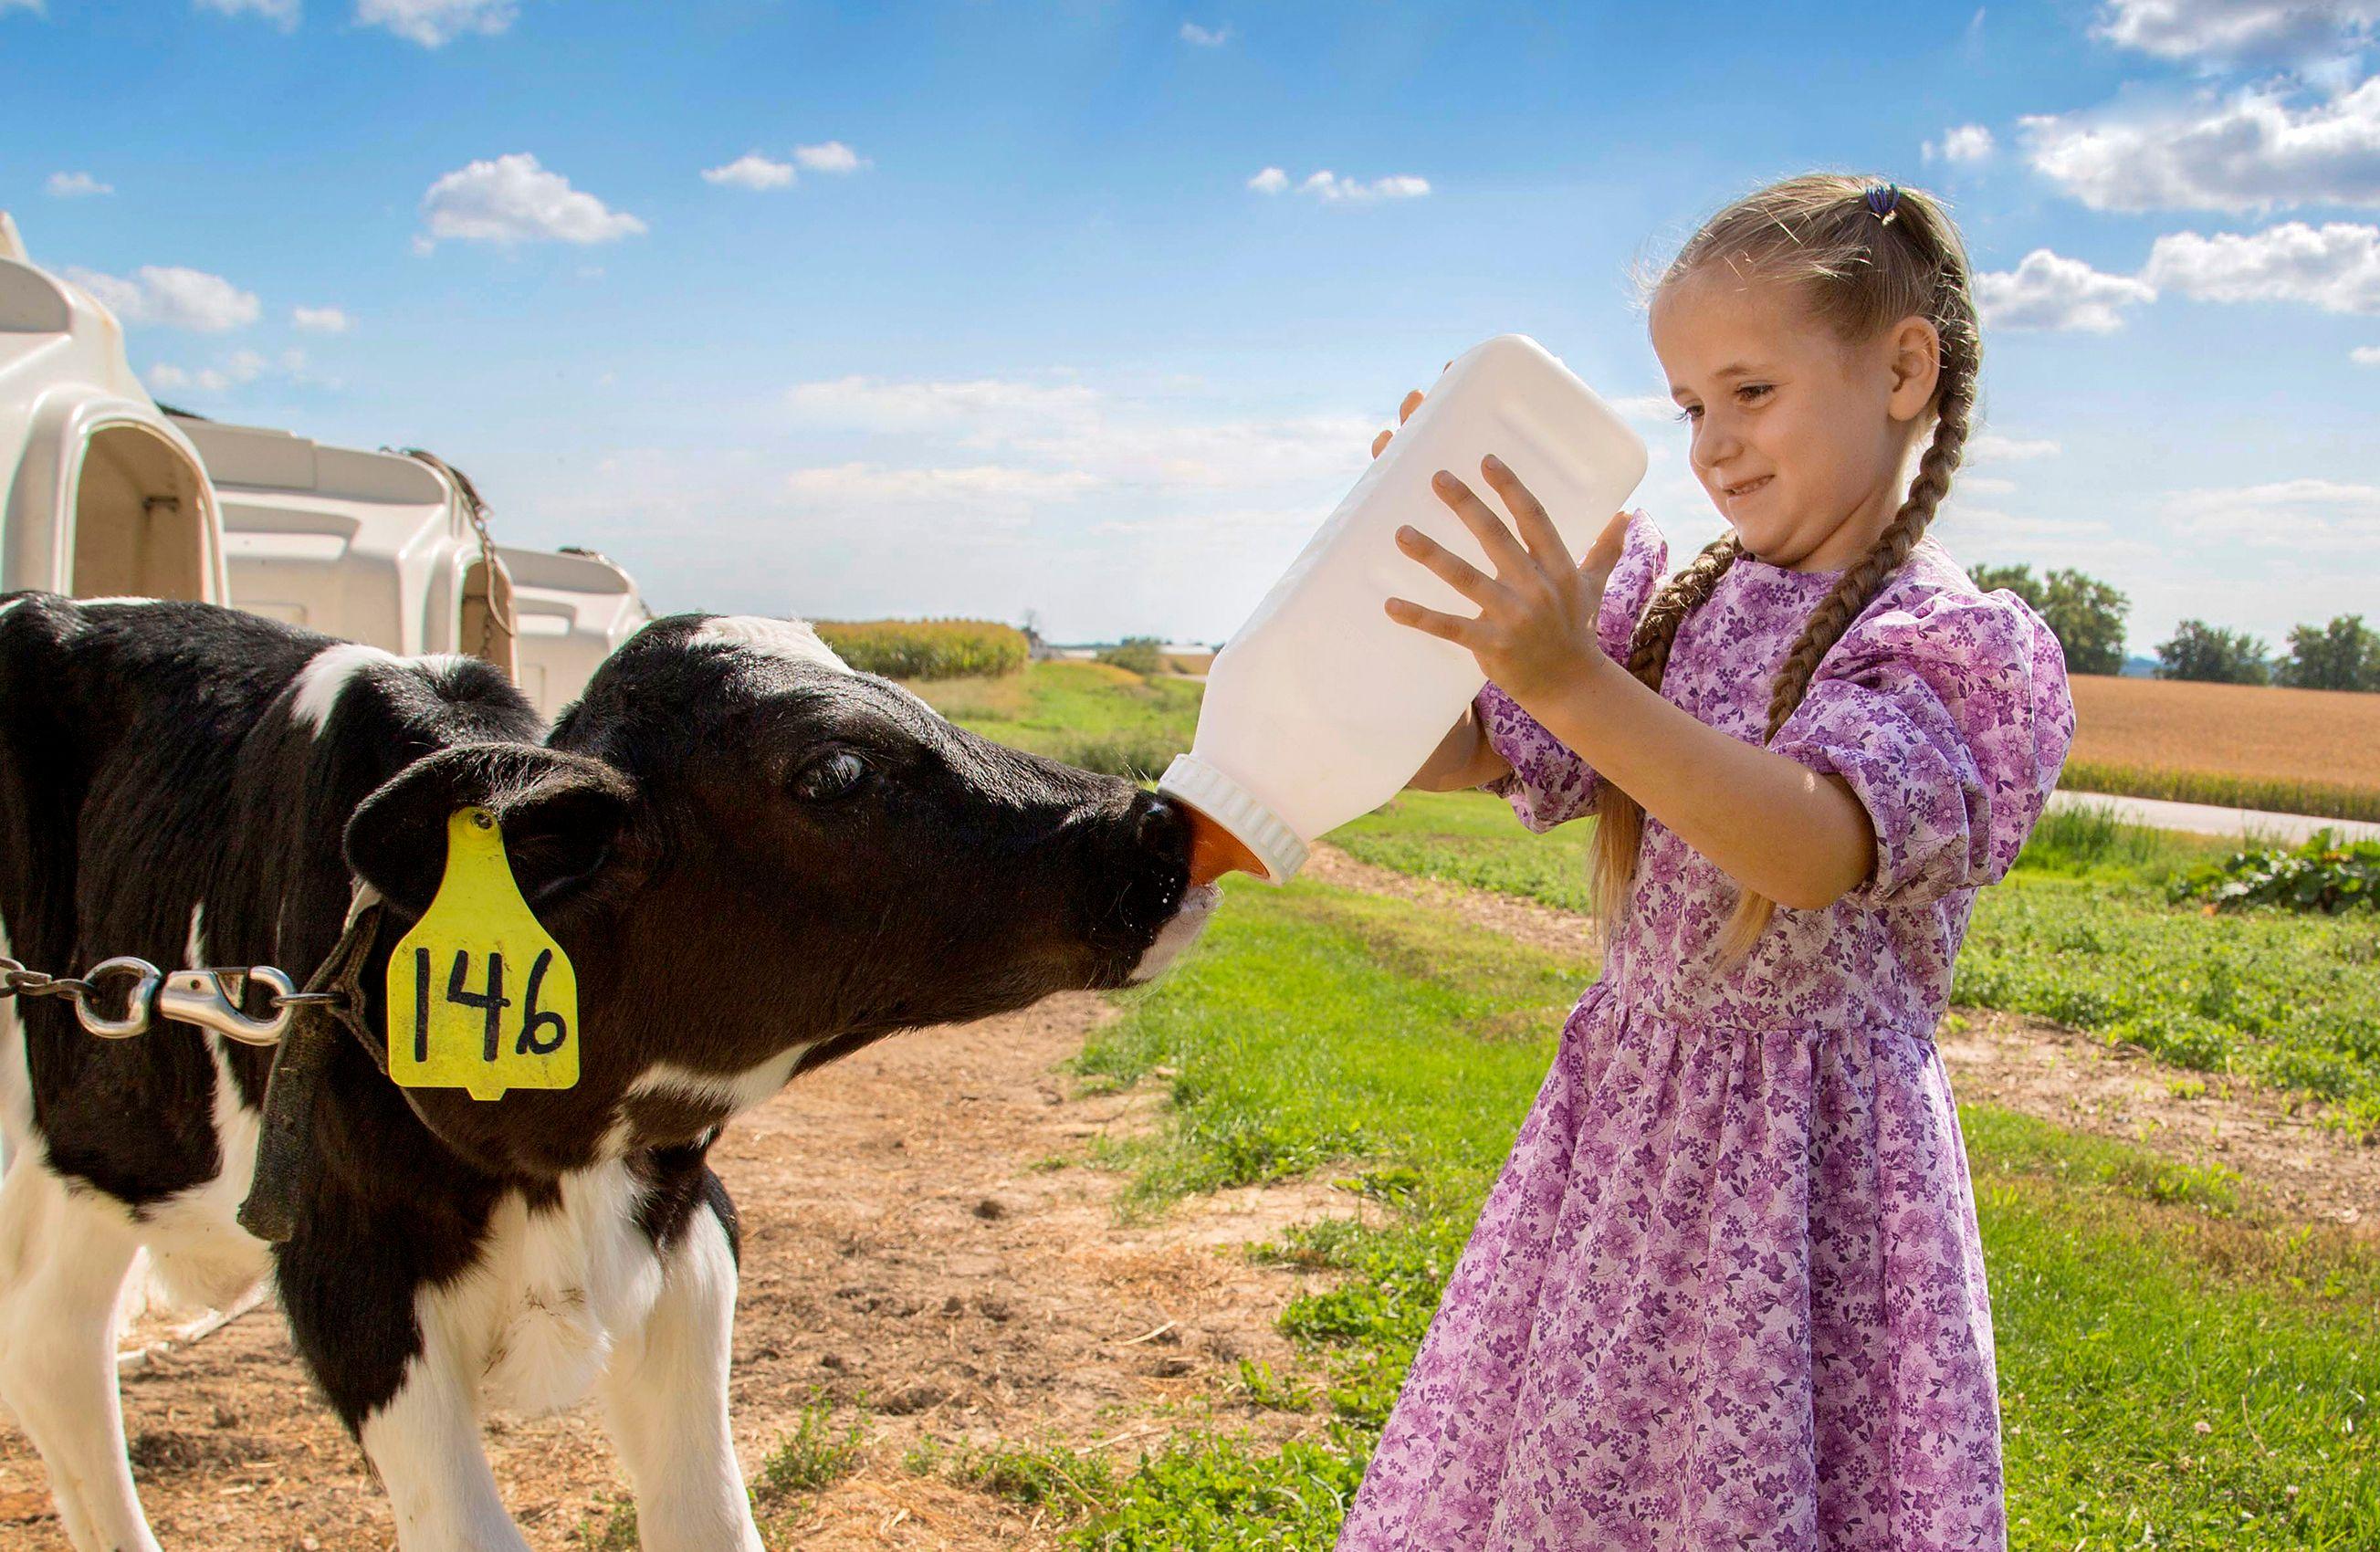 Girl_Feeding_Calf_HARP8366_F2.jpg